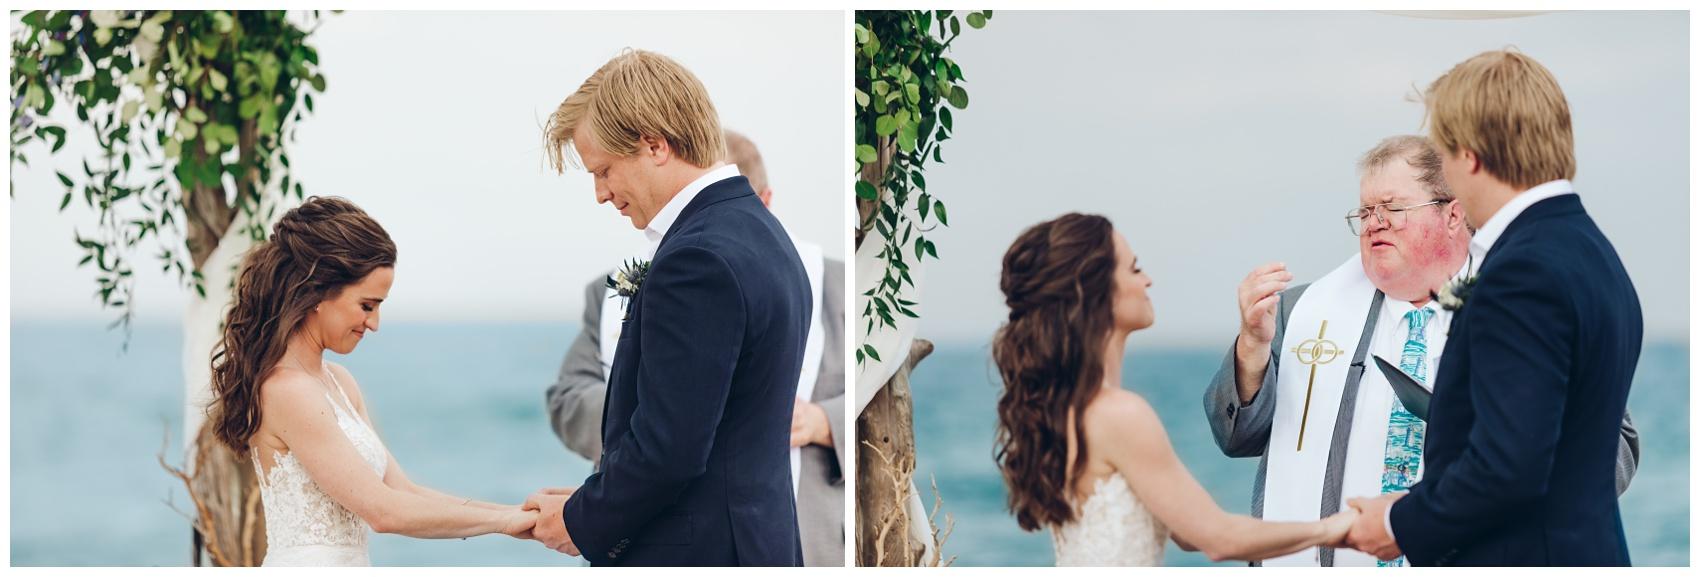 Outer-Banks-Corolla-Wedding_0064.jpg